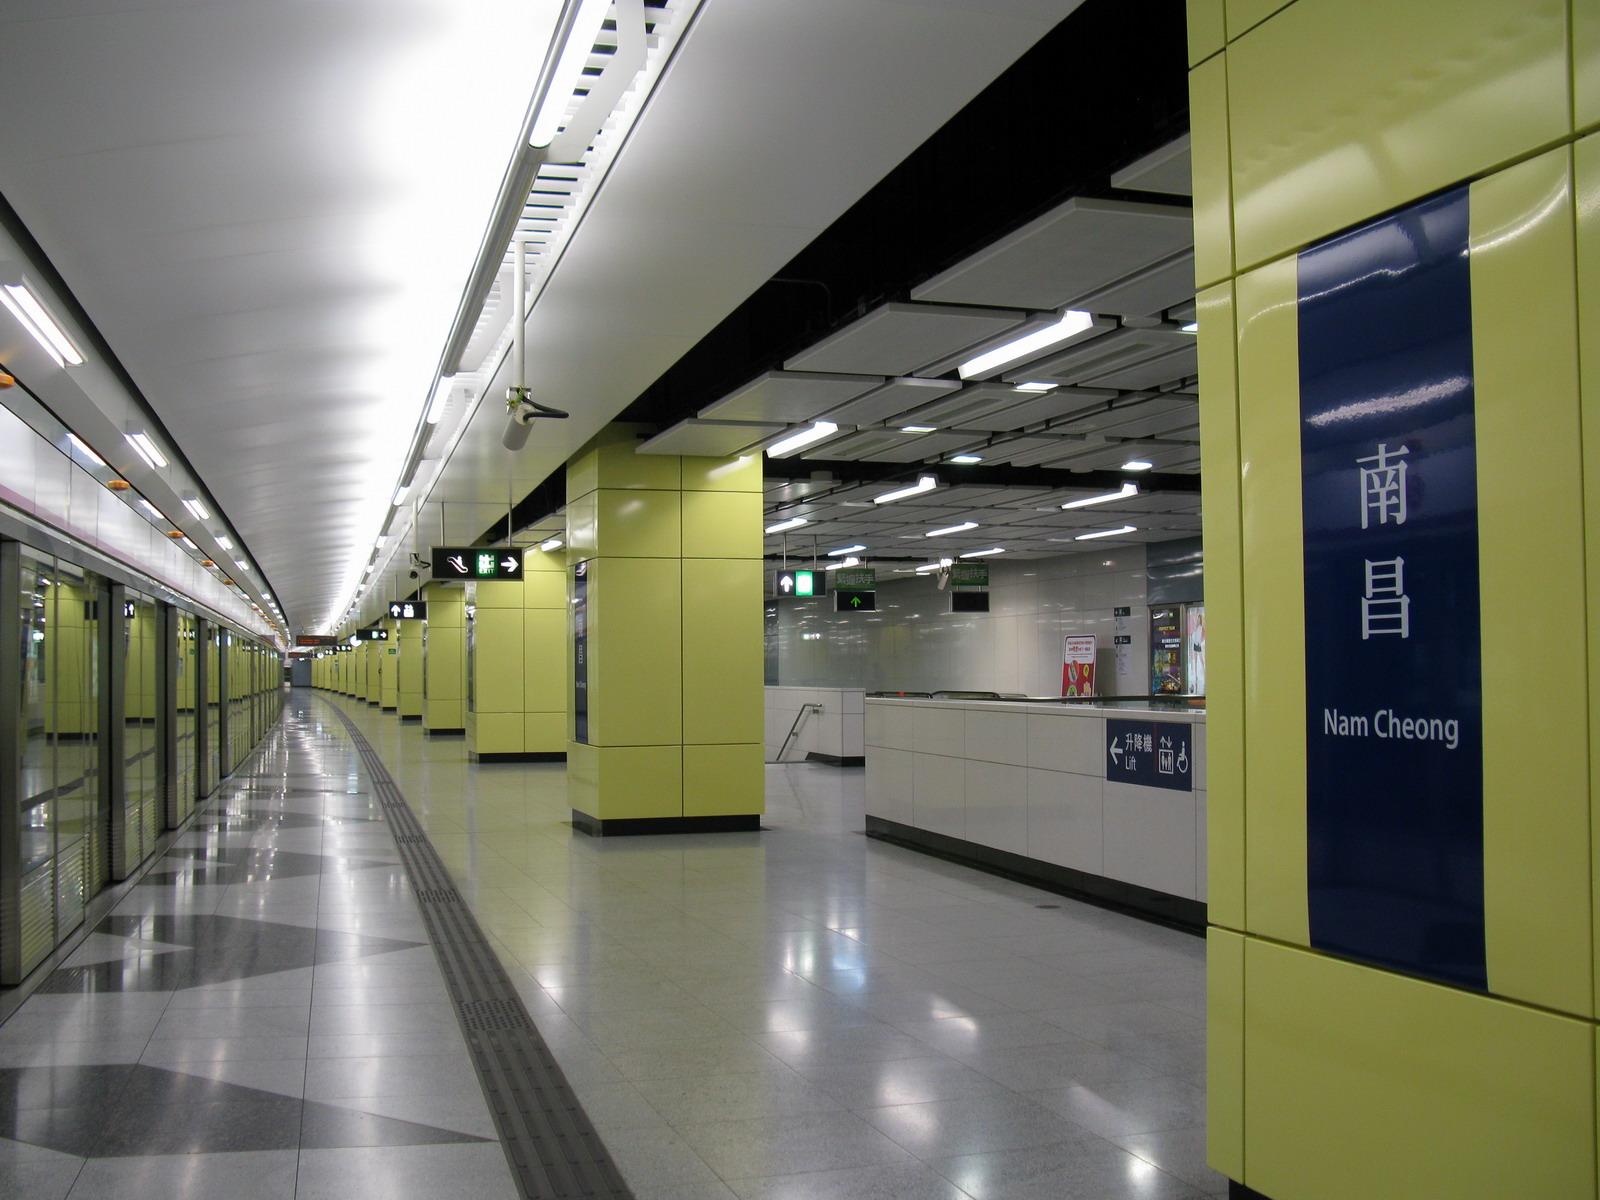 Nam_Cheong_Station_West_Rail_Line_Platform.jpg